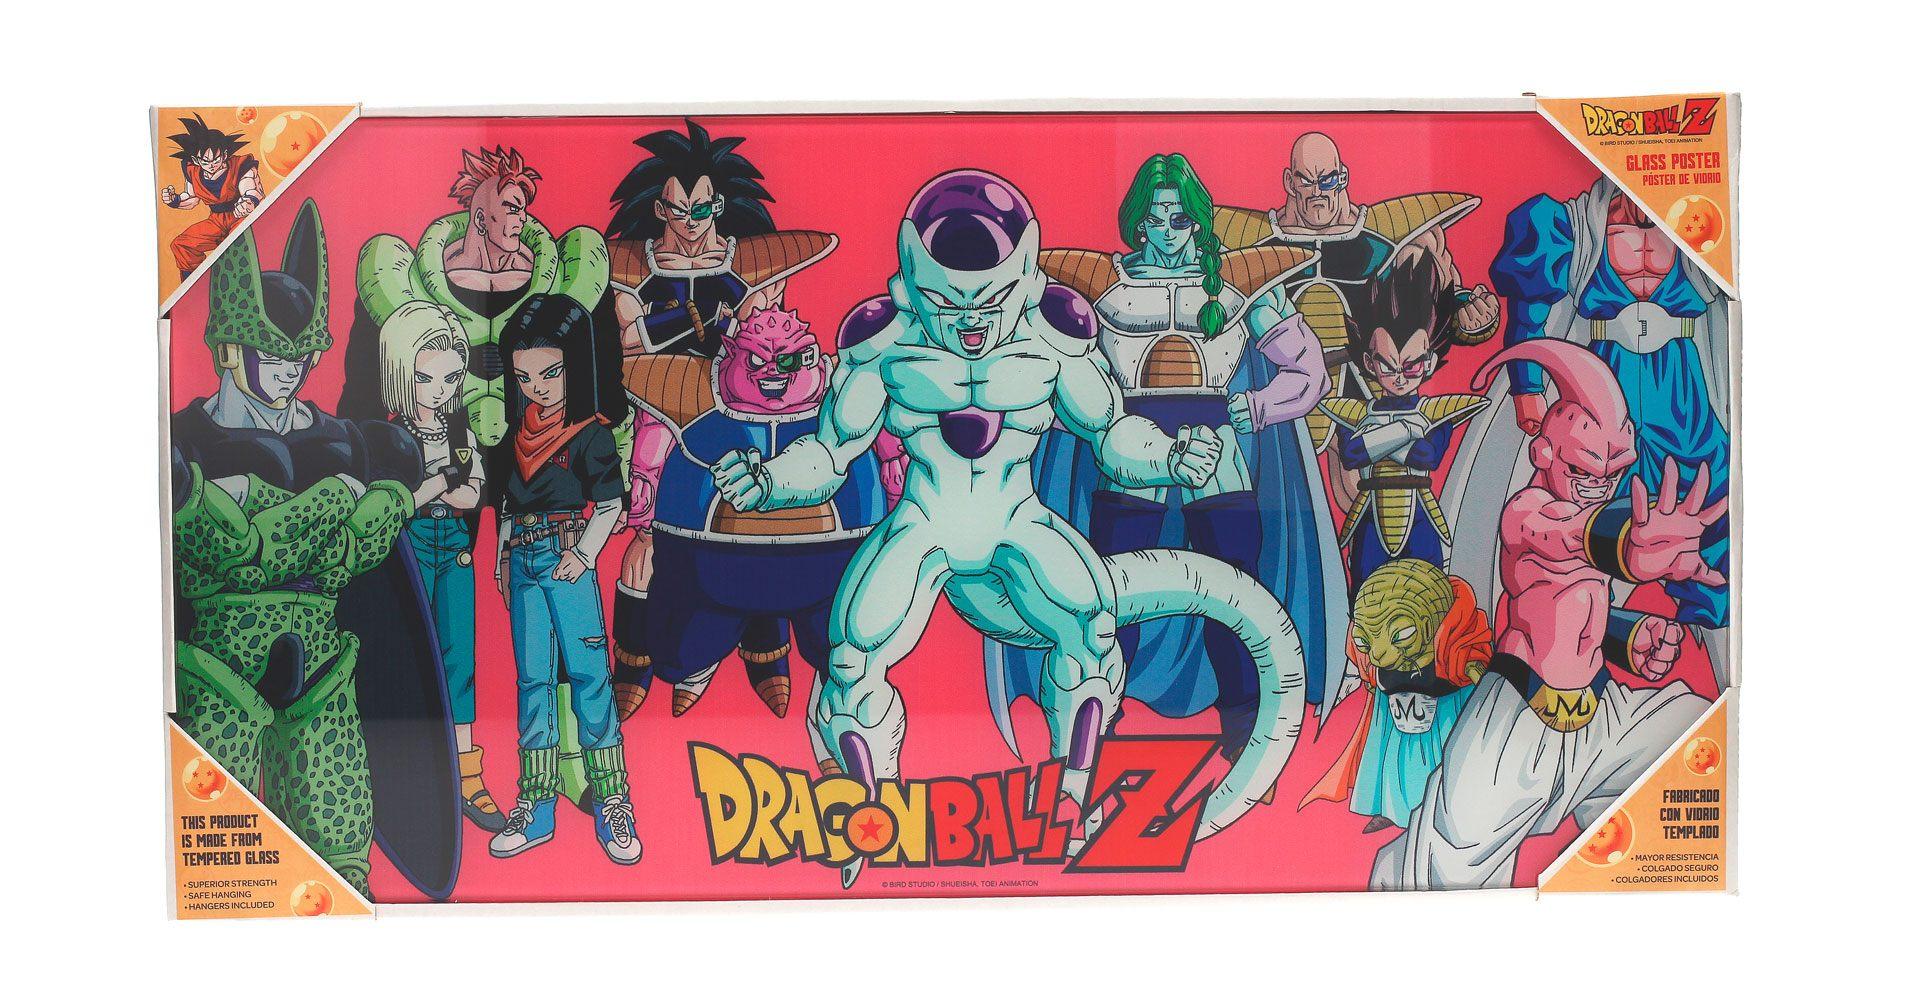 Dragonball Z Glass Poster Villains 30 x 60 cm